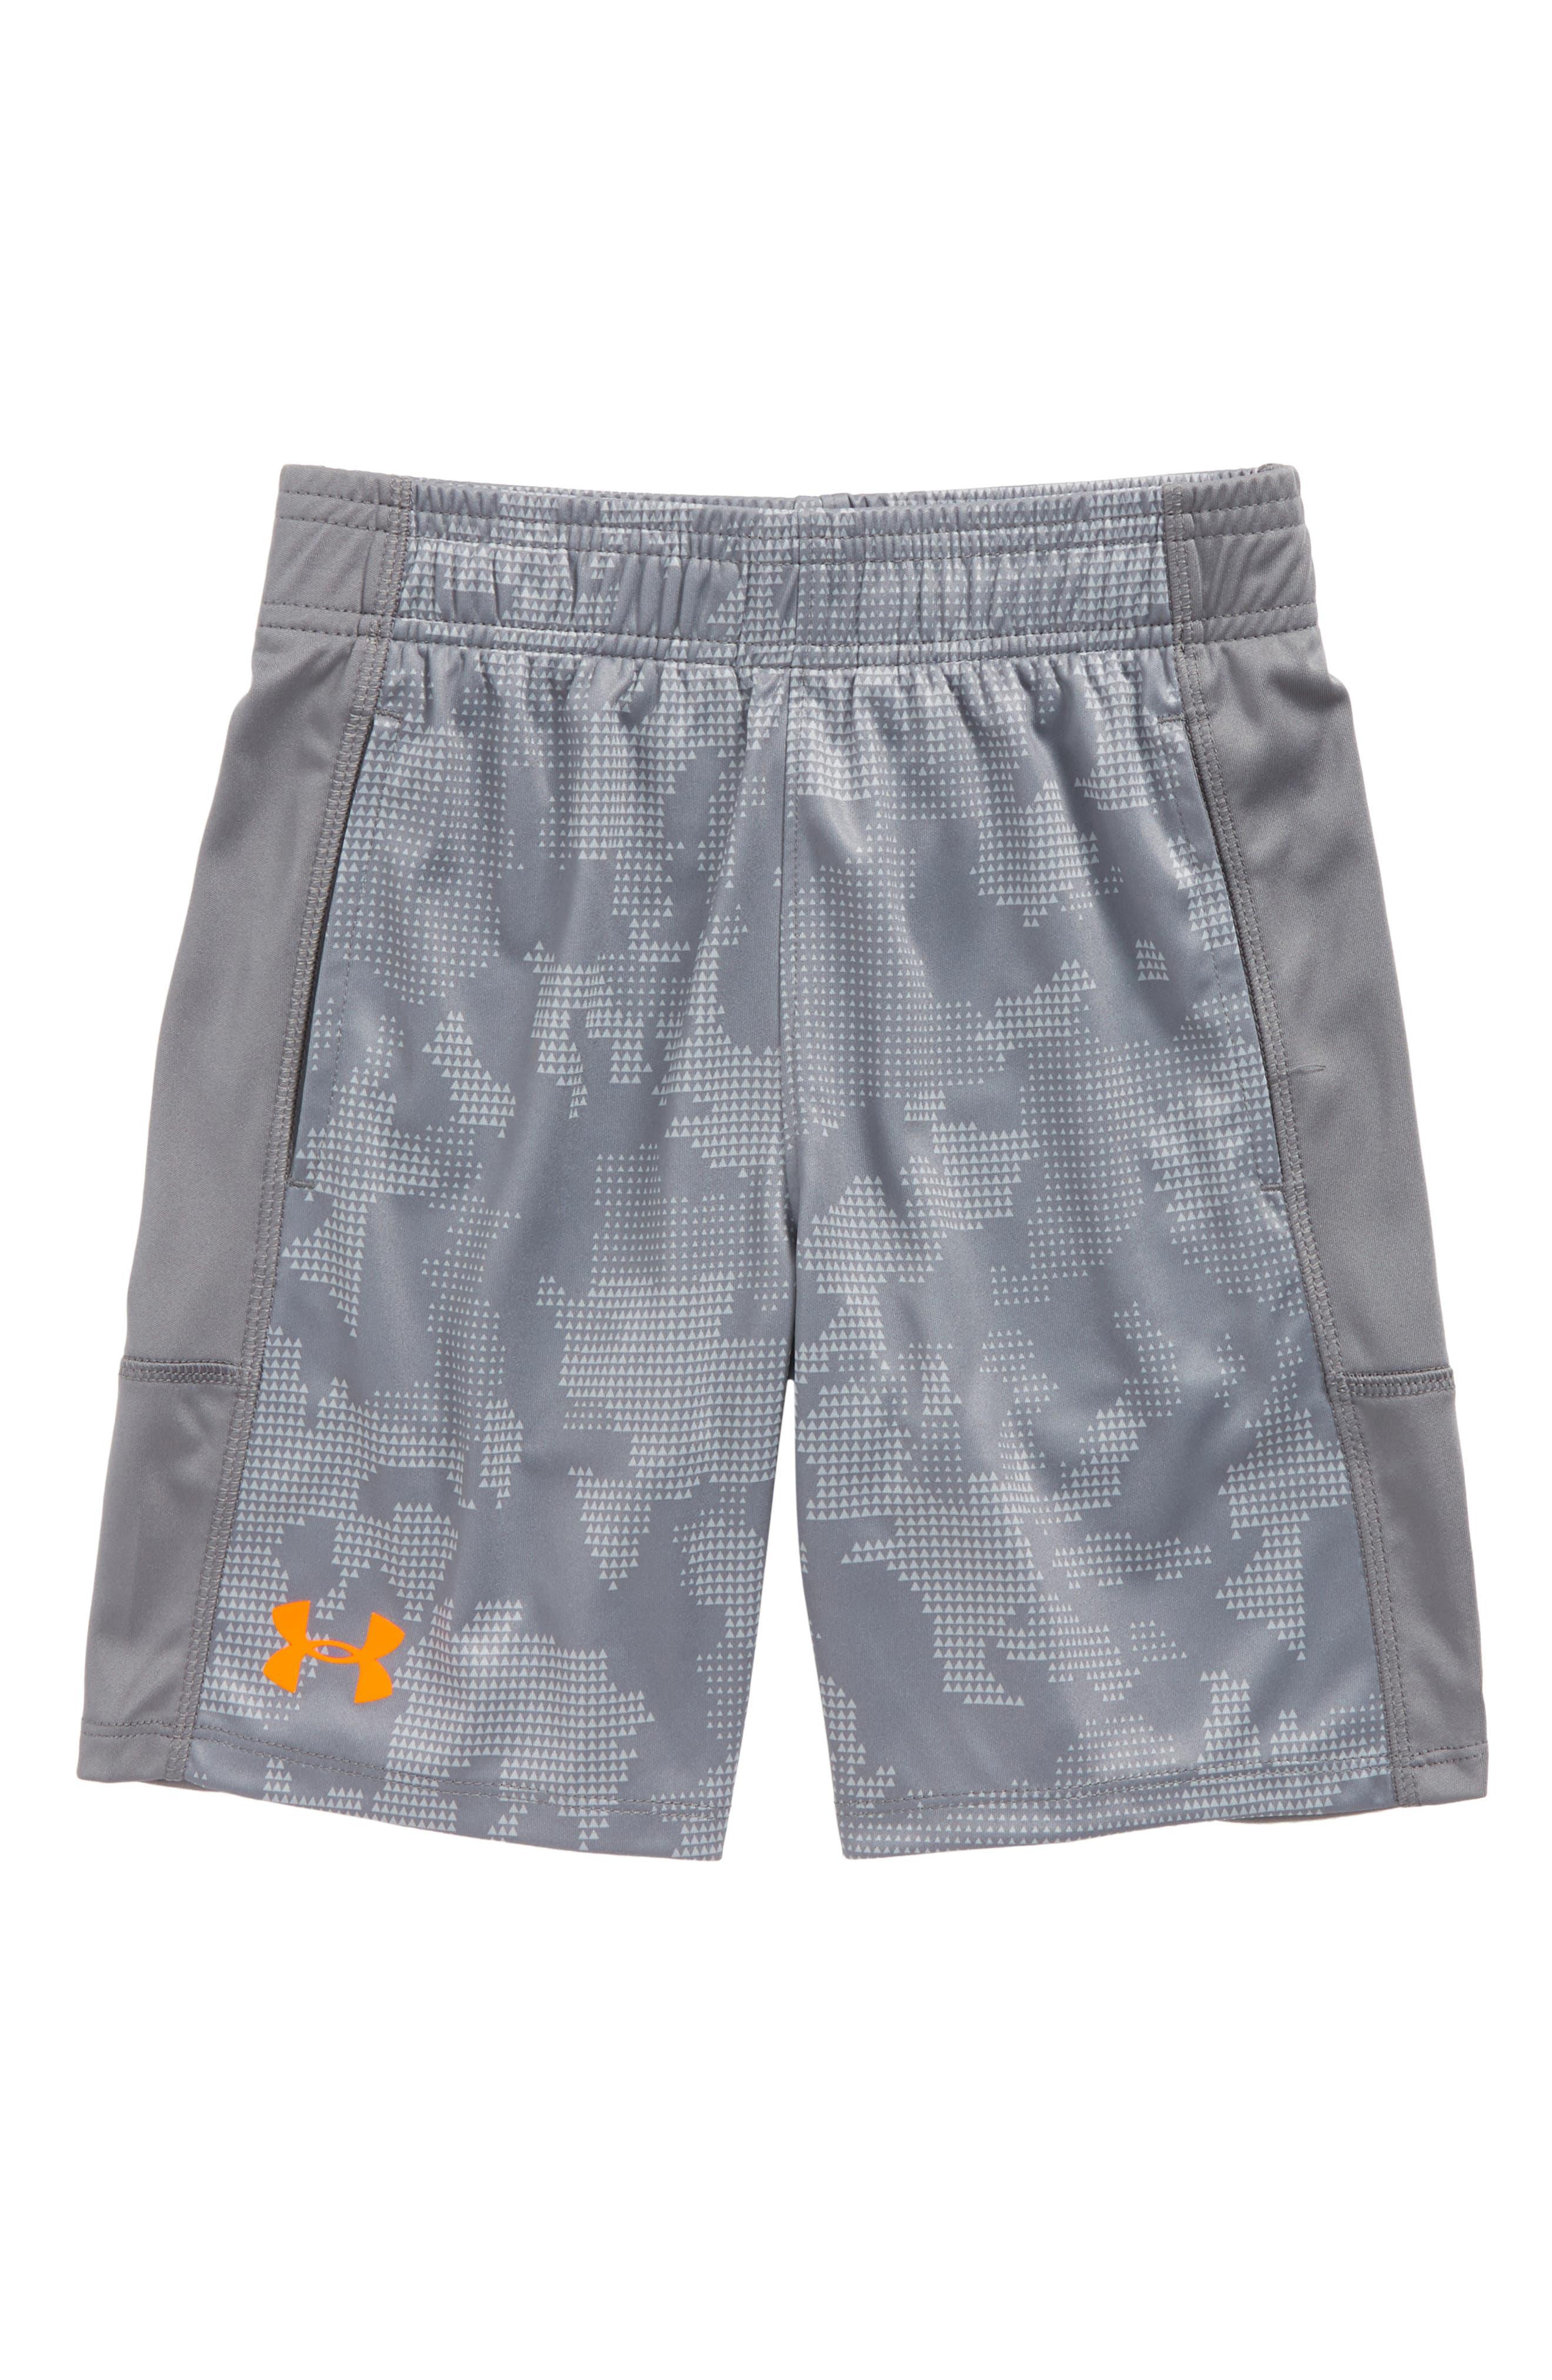 Main Image - Under Armour Stunt HeatGear® Shorts (Toddler Boys & LIttle Boys)